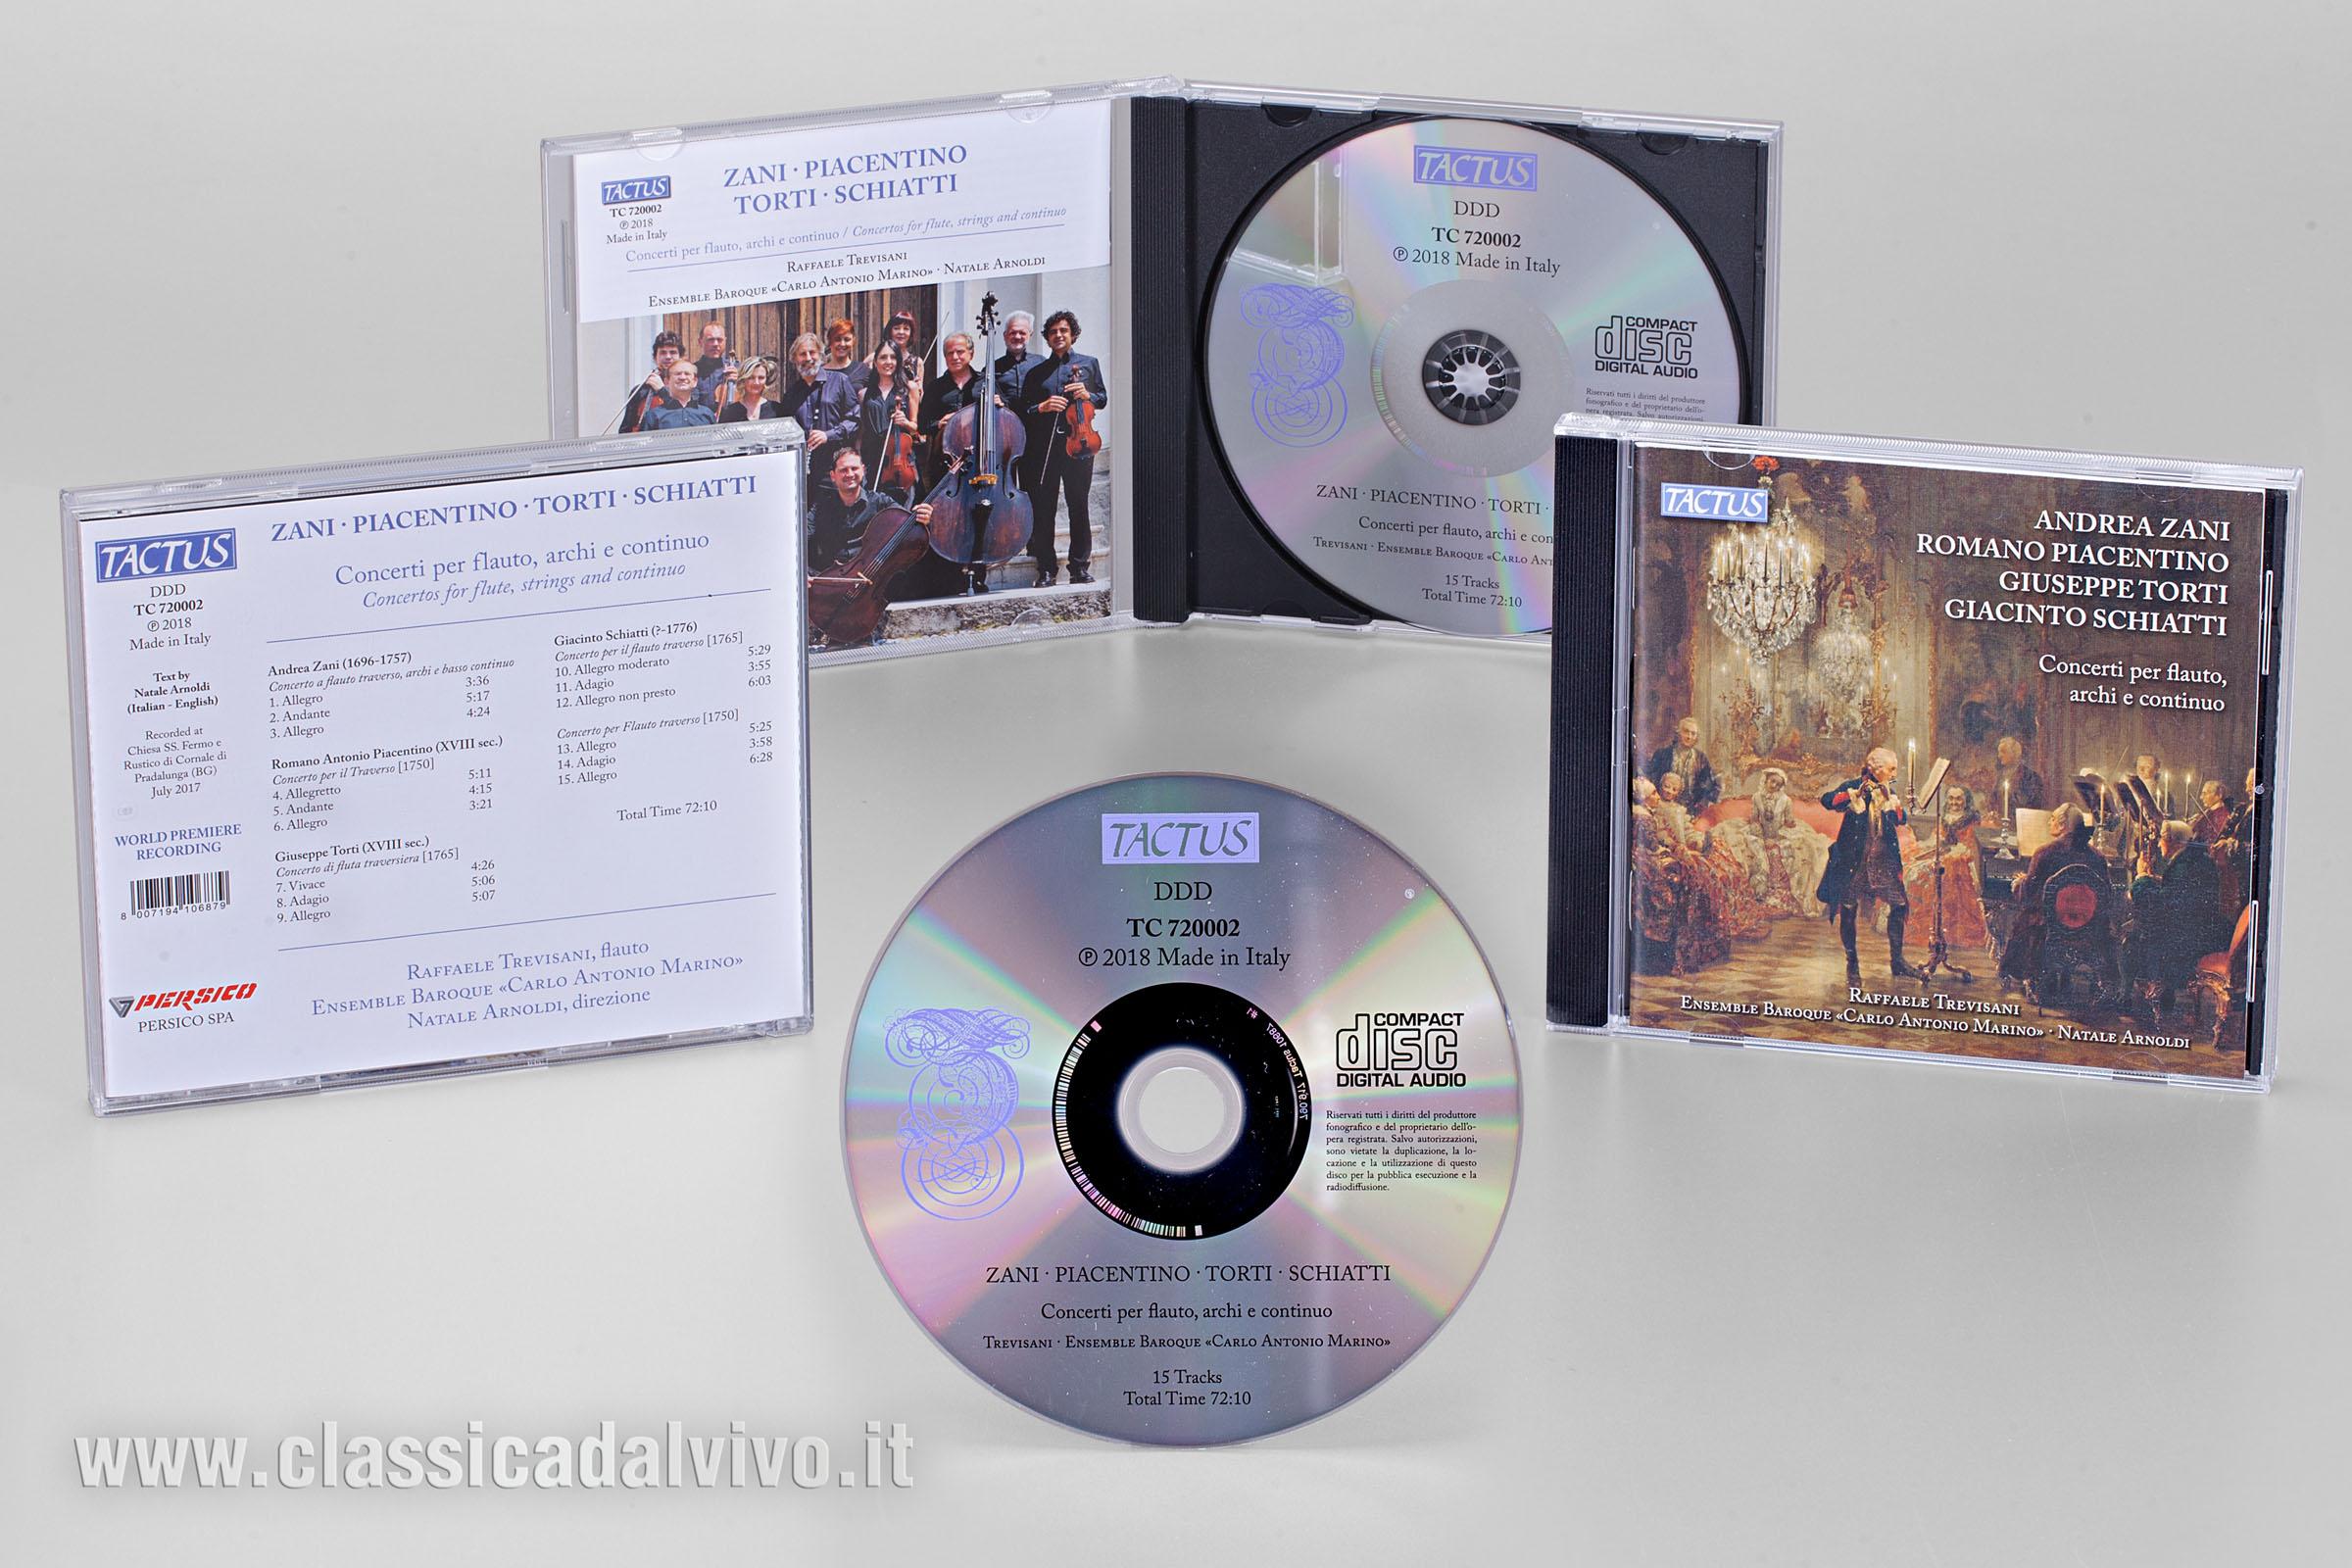 Ensemble Carlo Antonio Marino - Raffaele Trevisani - TACTUS